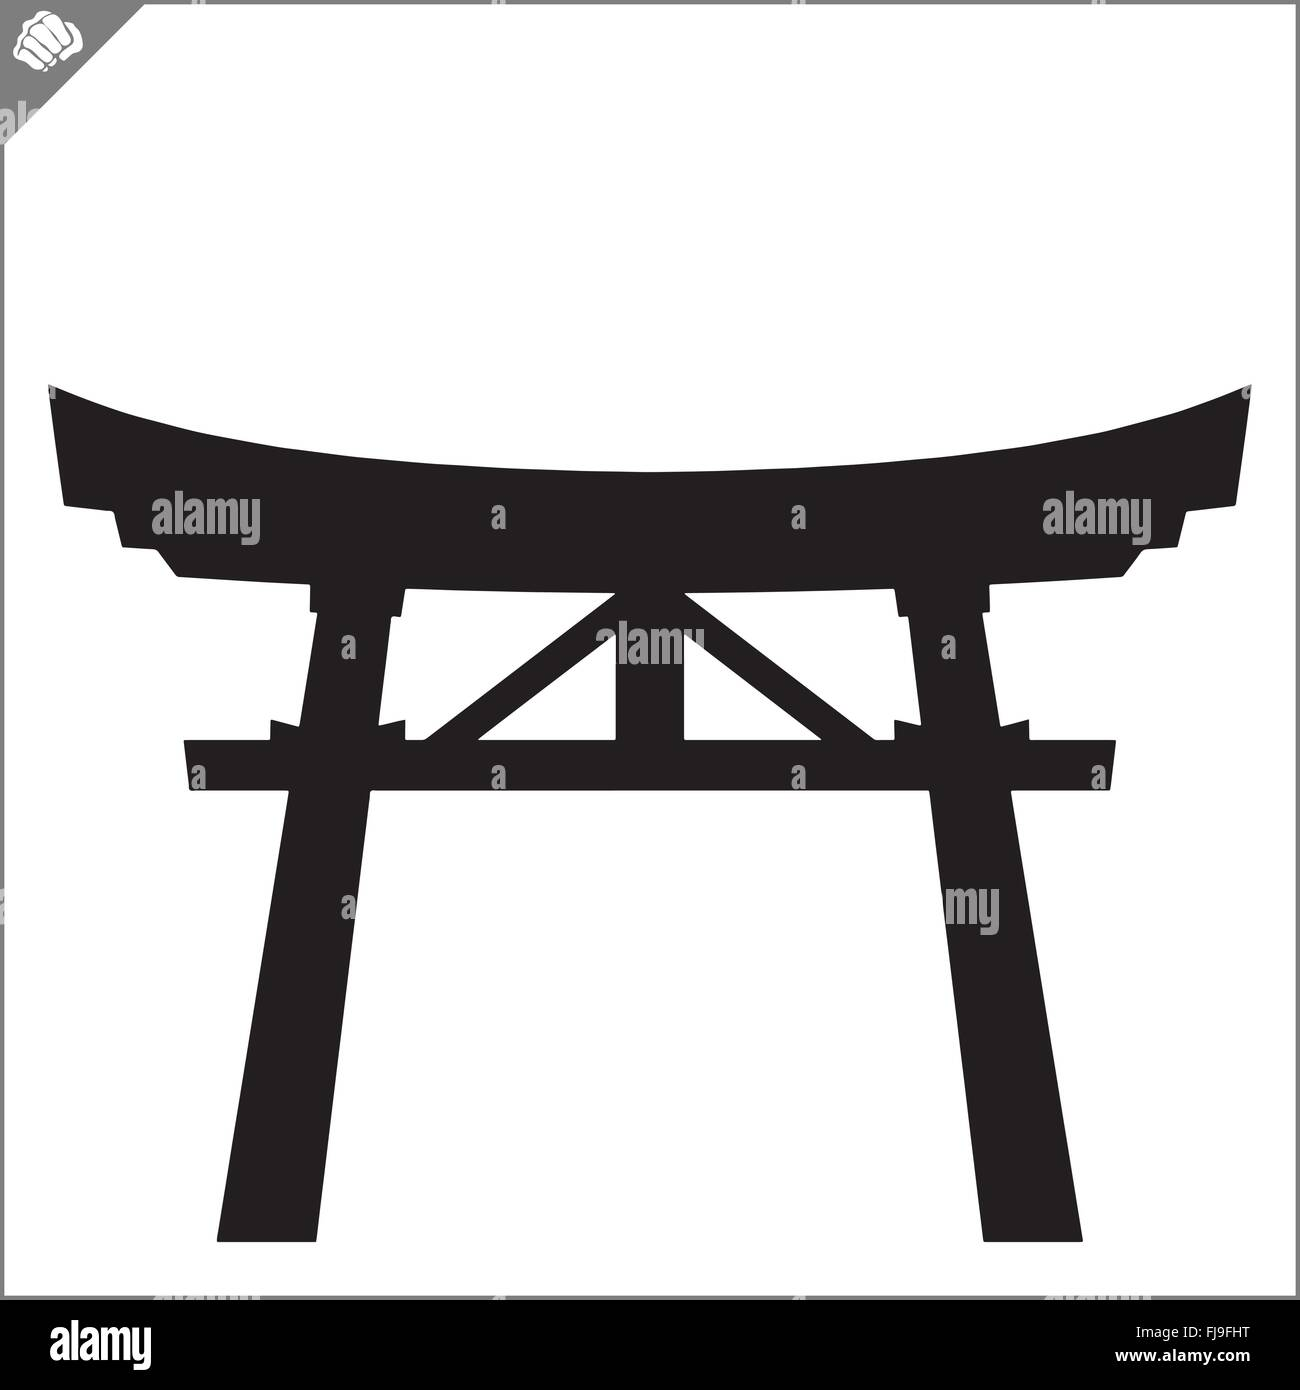 Japan traditional gate torii stock vector art illustration japan traditional gate torii biocorpaavc